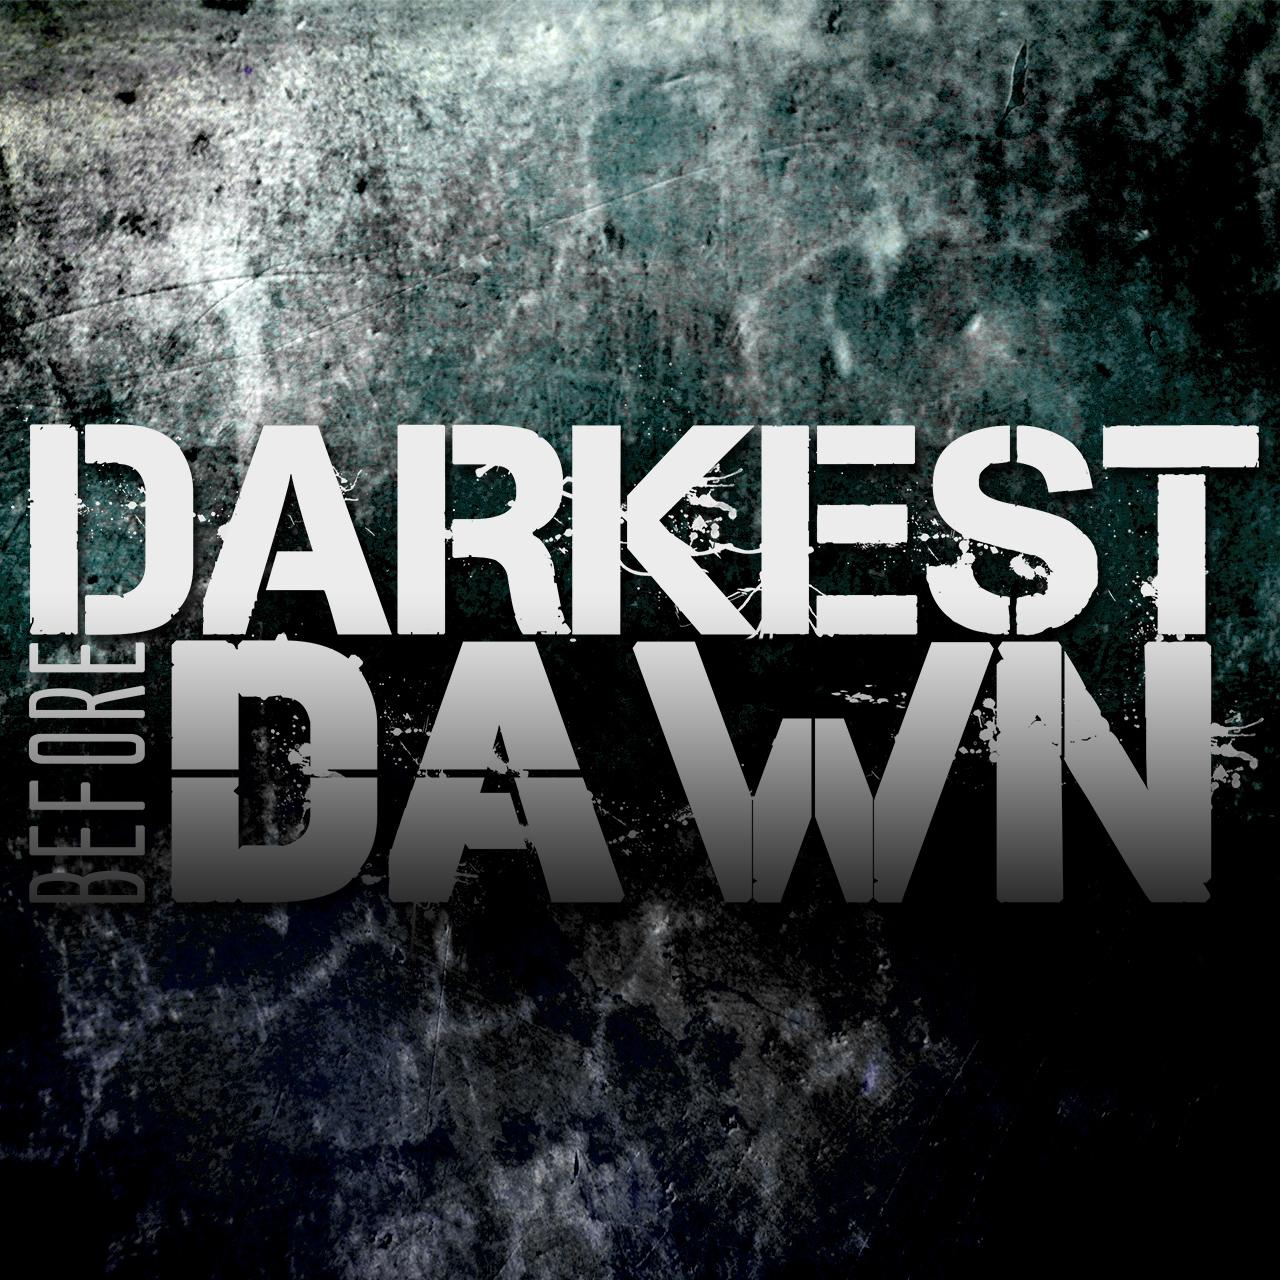 Darkest-Before-Dawn-v2-Text-Only